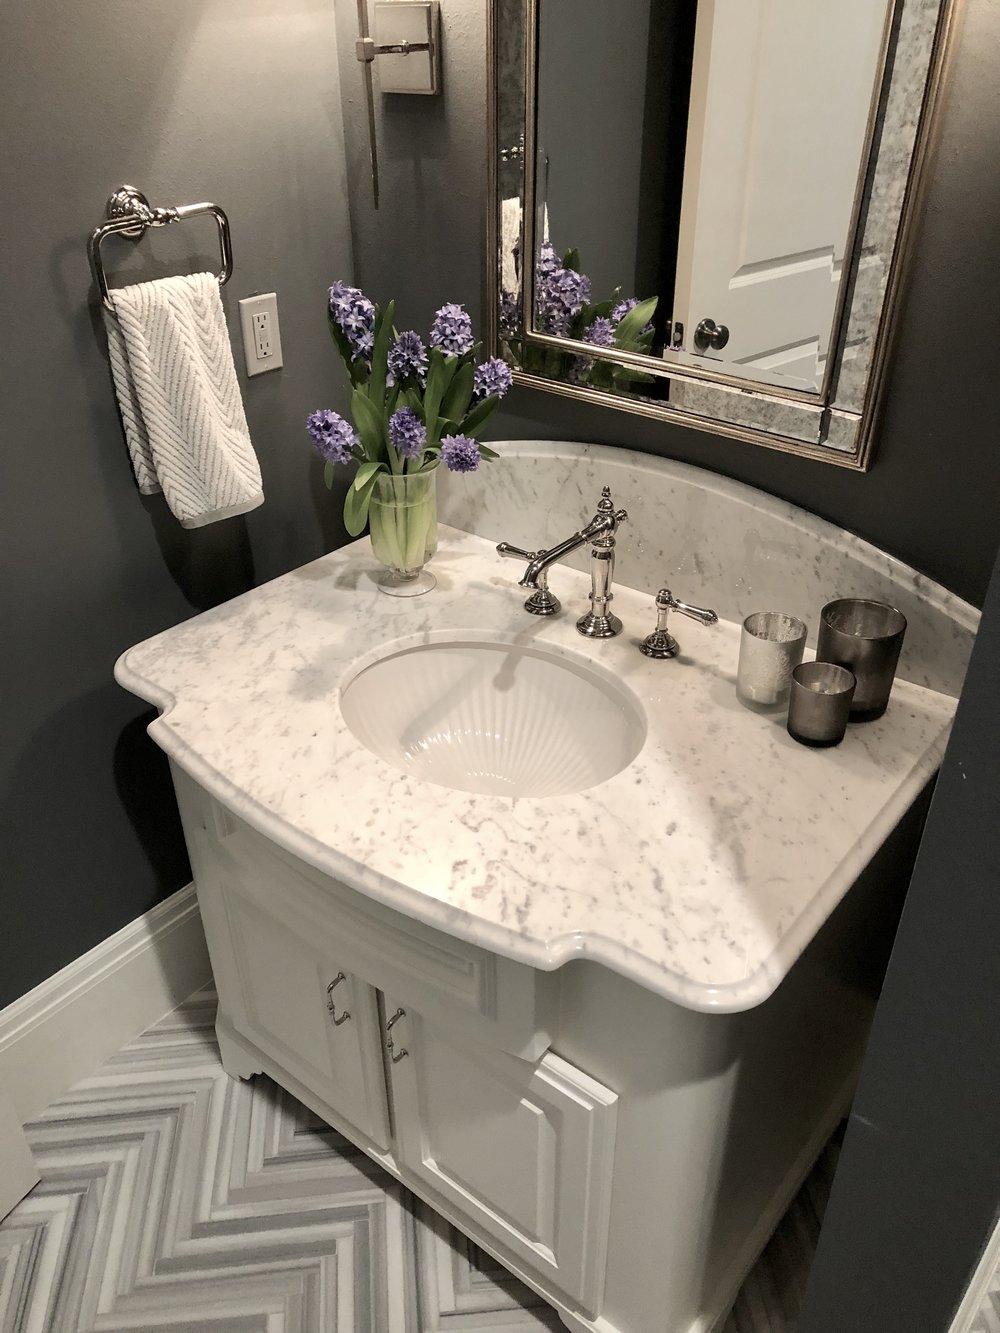 POWDER BATH ROUND UP |Gray powder bath with herringbone marble tile floor, Carrara marble countertop and curved splash | Designer: Carla Aston #powderbath #powderroom